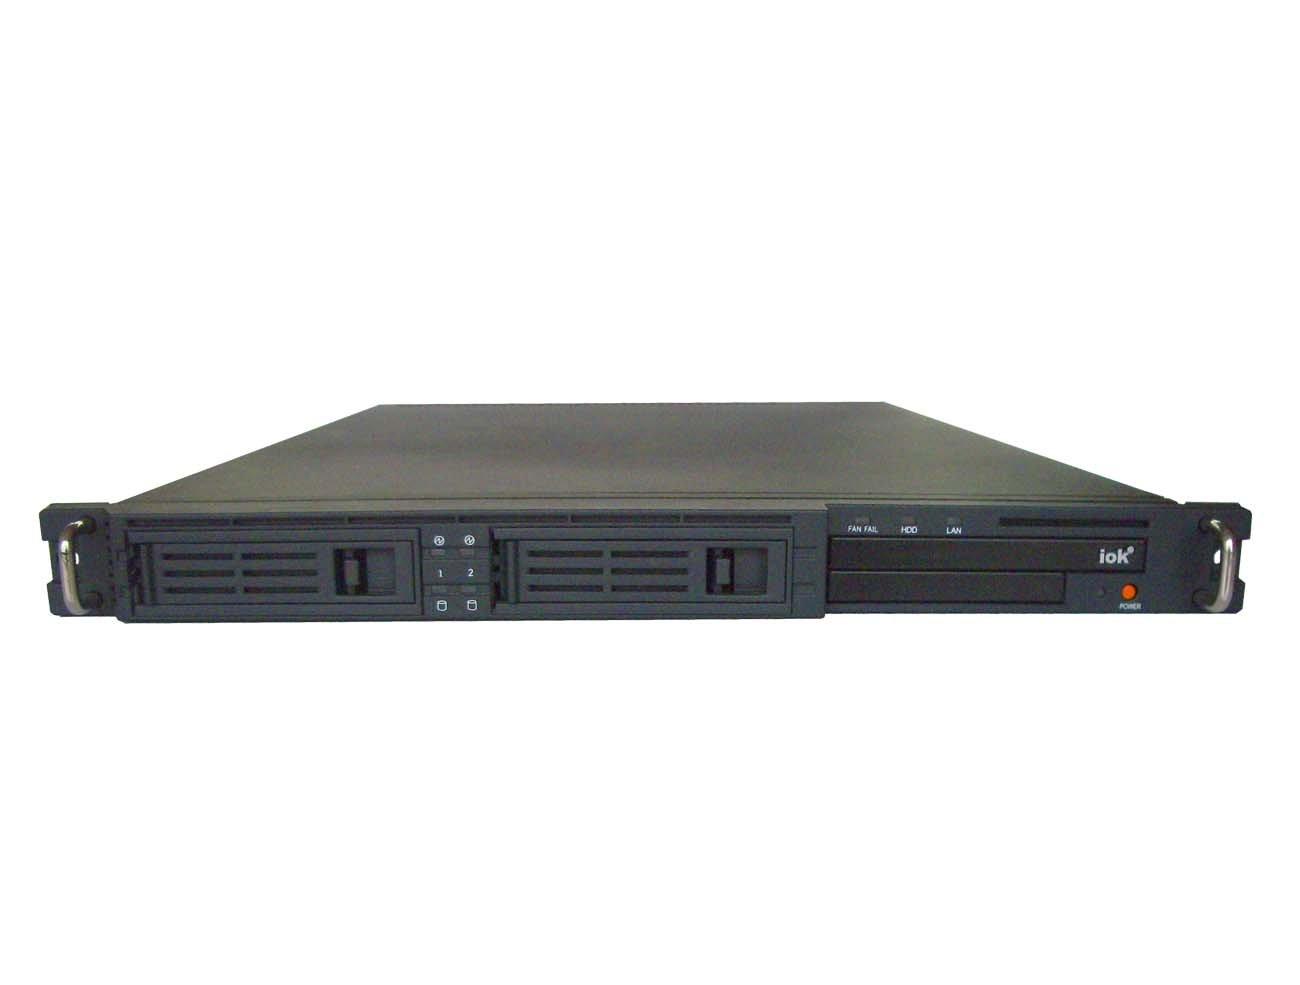 Server Rack Mount Cosmecol